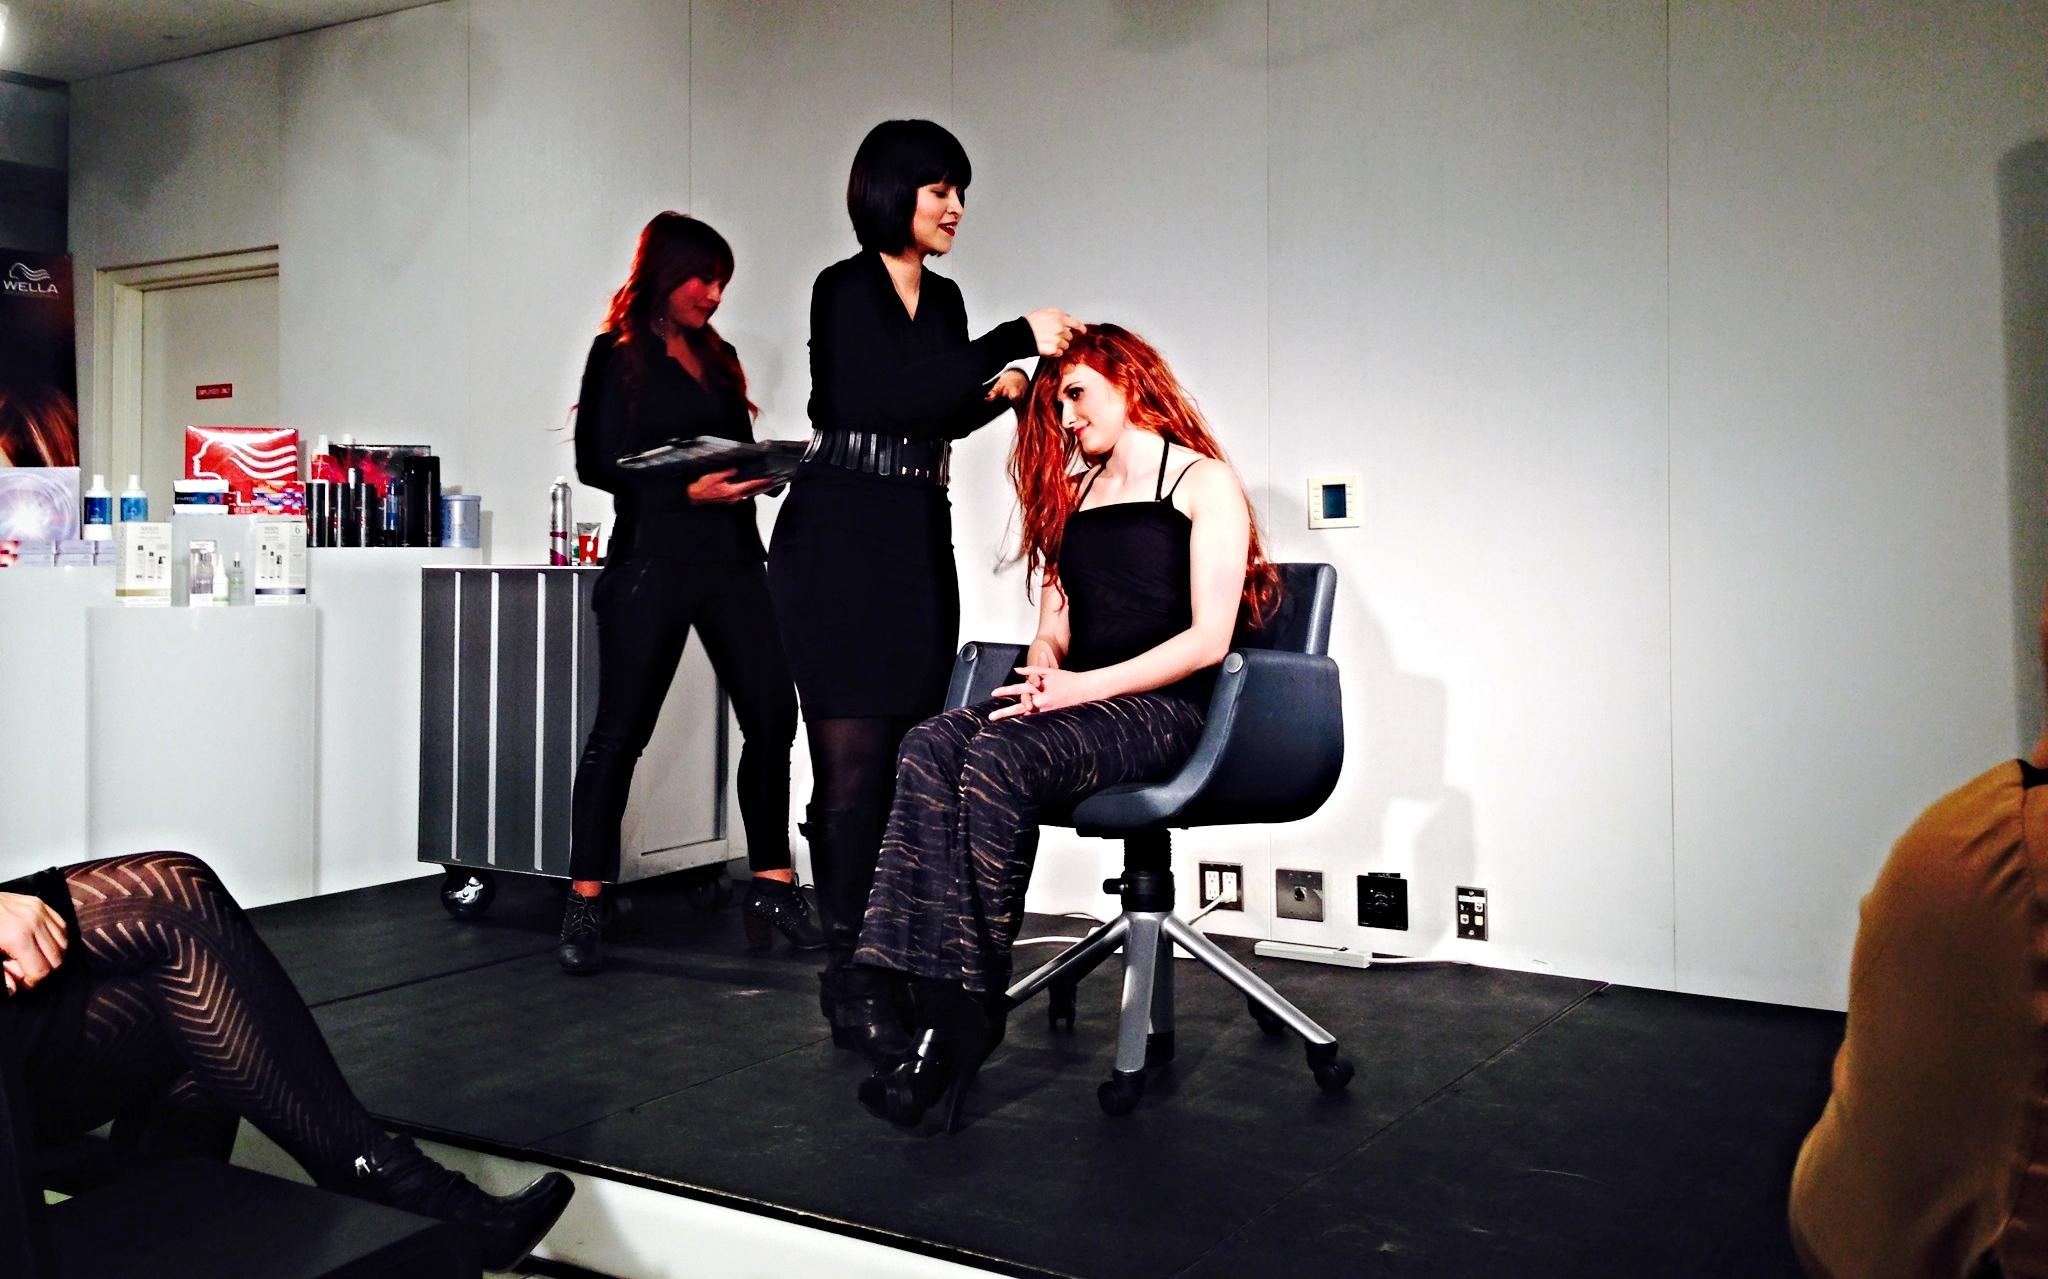 Buzz Salon, Jodi Connolly and Breanna Zink, attend Wella hair class in New York.